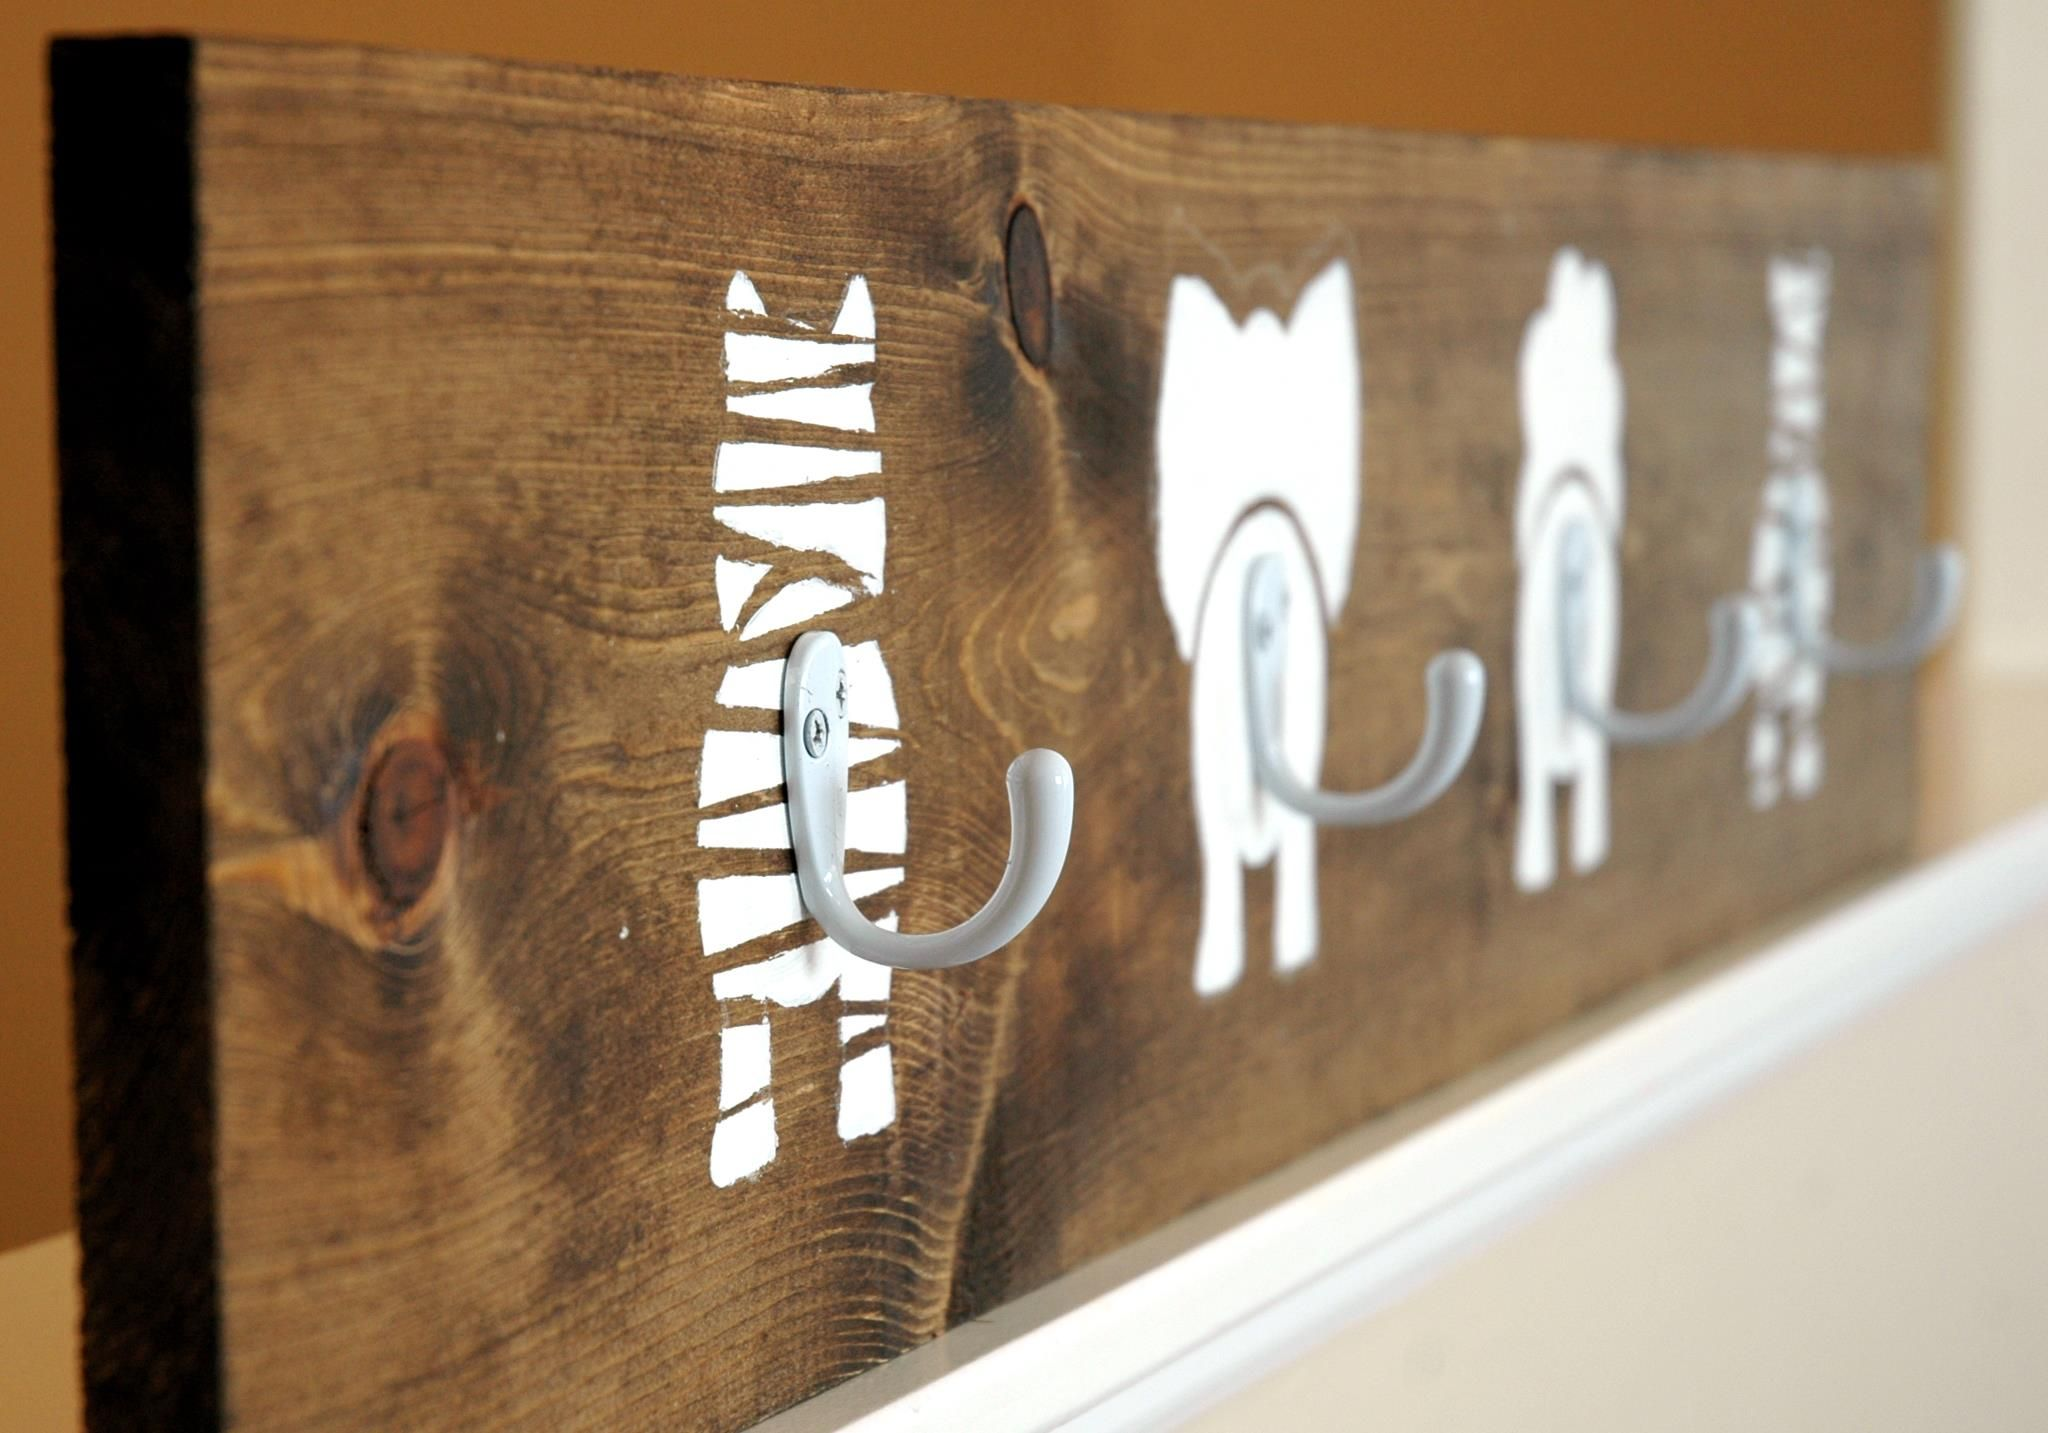 Kinderkamer Ideeen Dieren : Kinderkamer jungle behang mooie fotobehang posterbehang